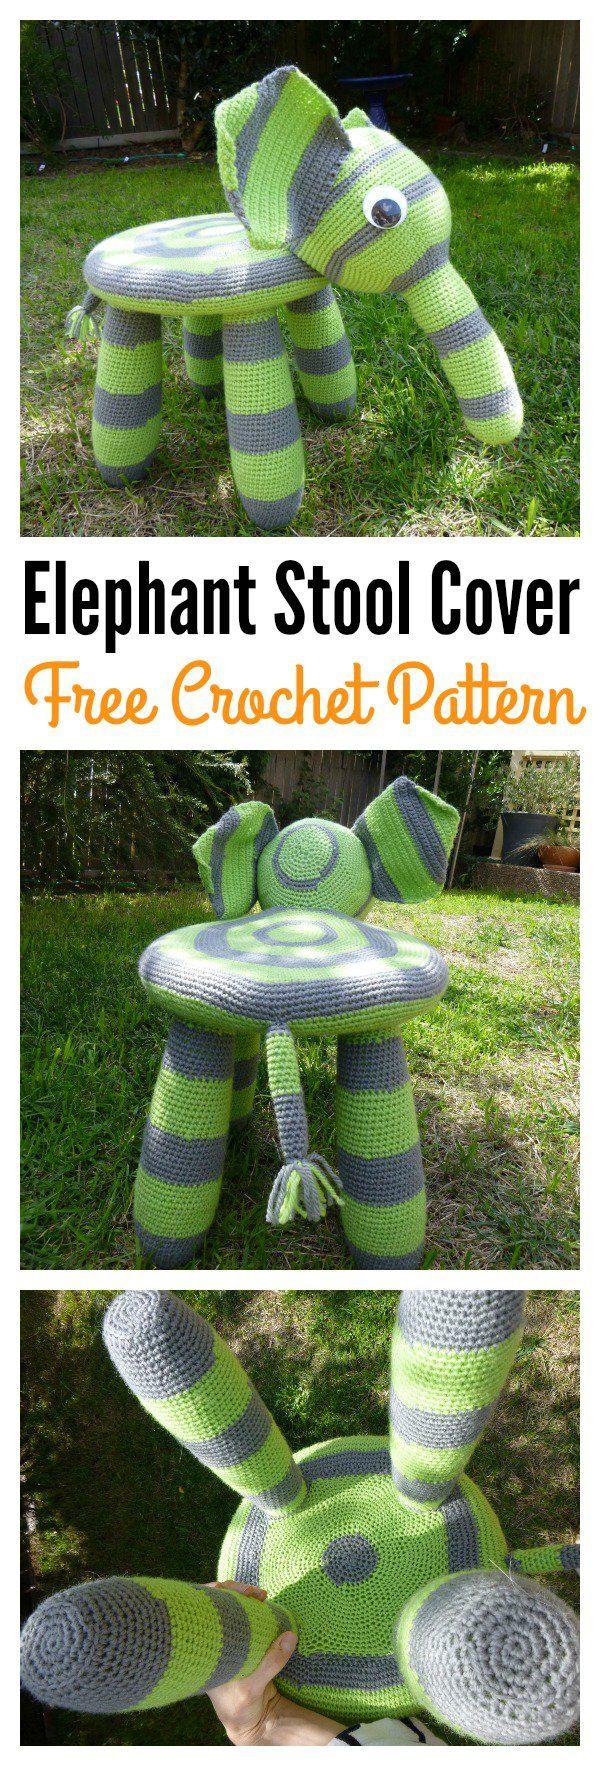 Crochet Elephant Ikea Stool Cover Free Pattern